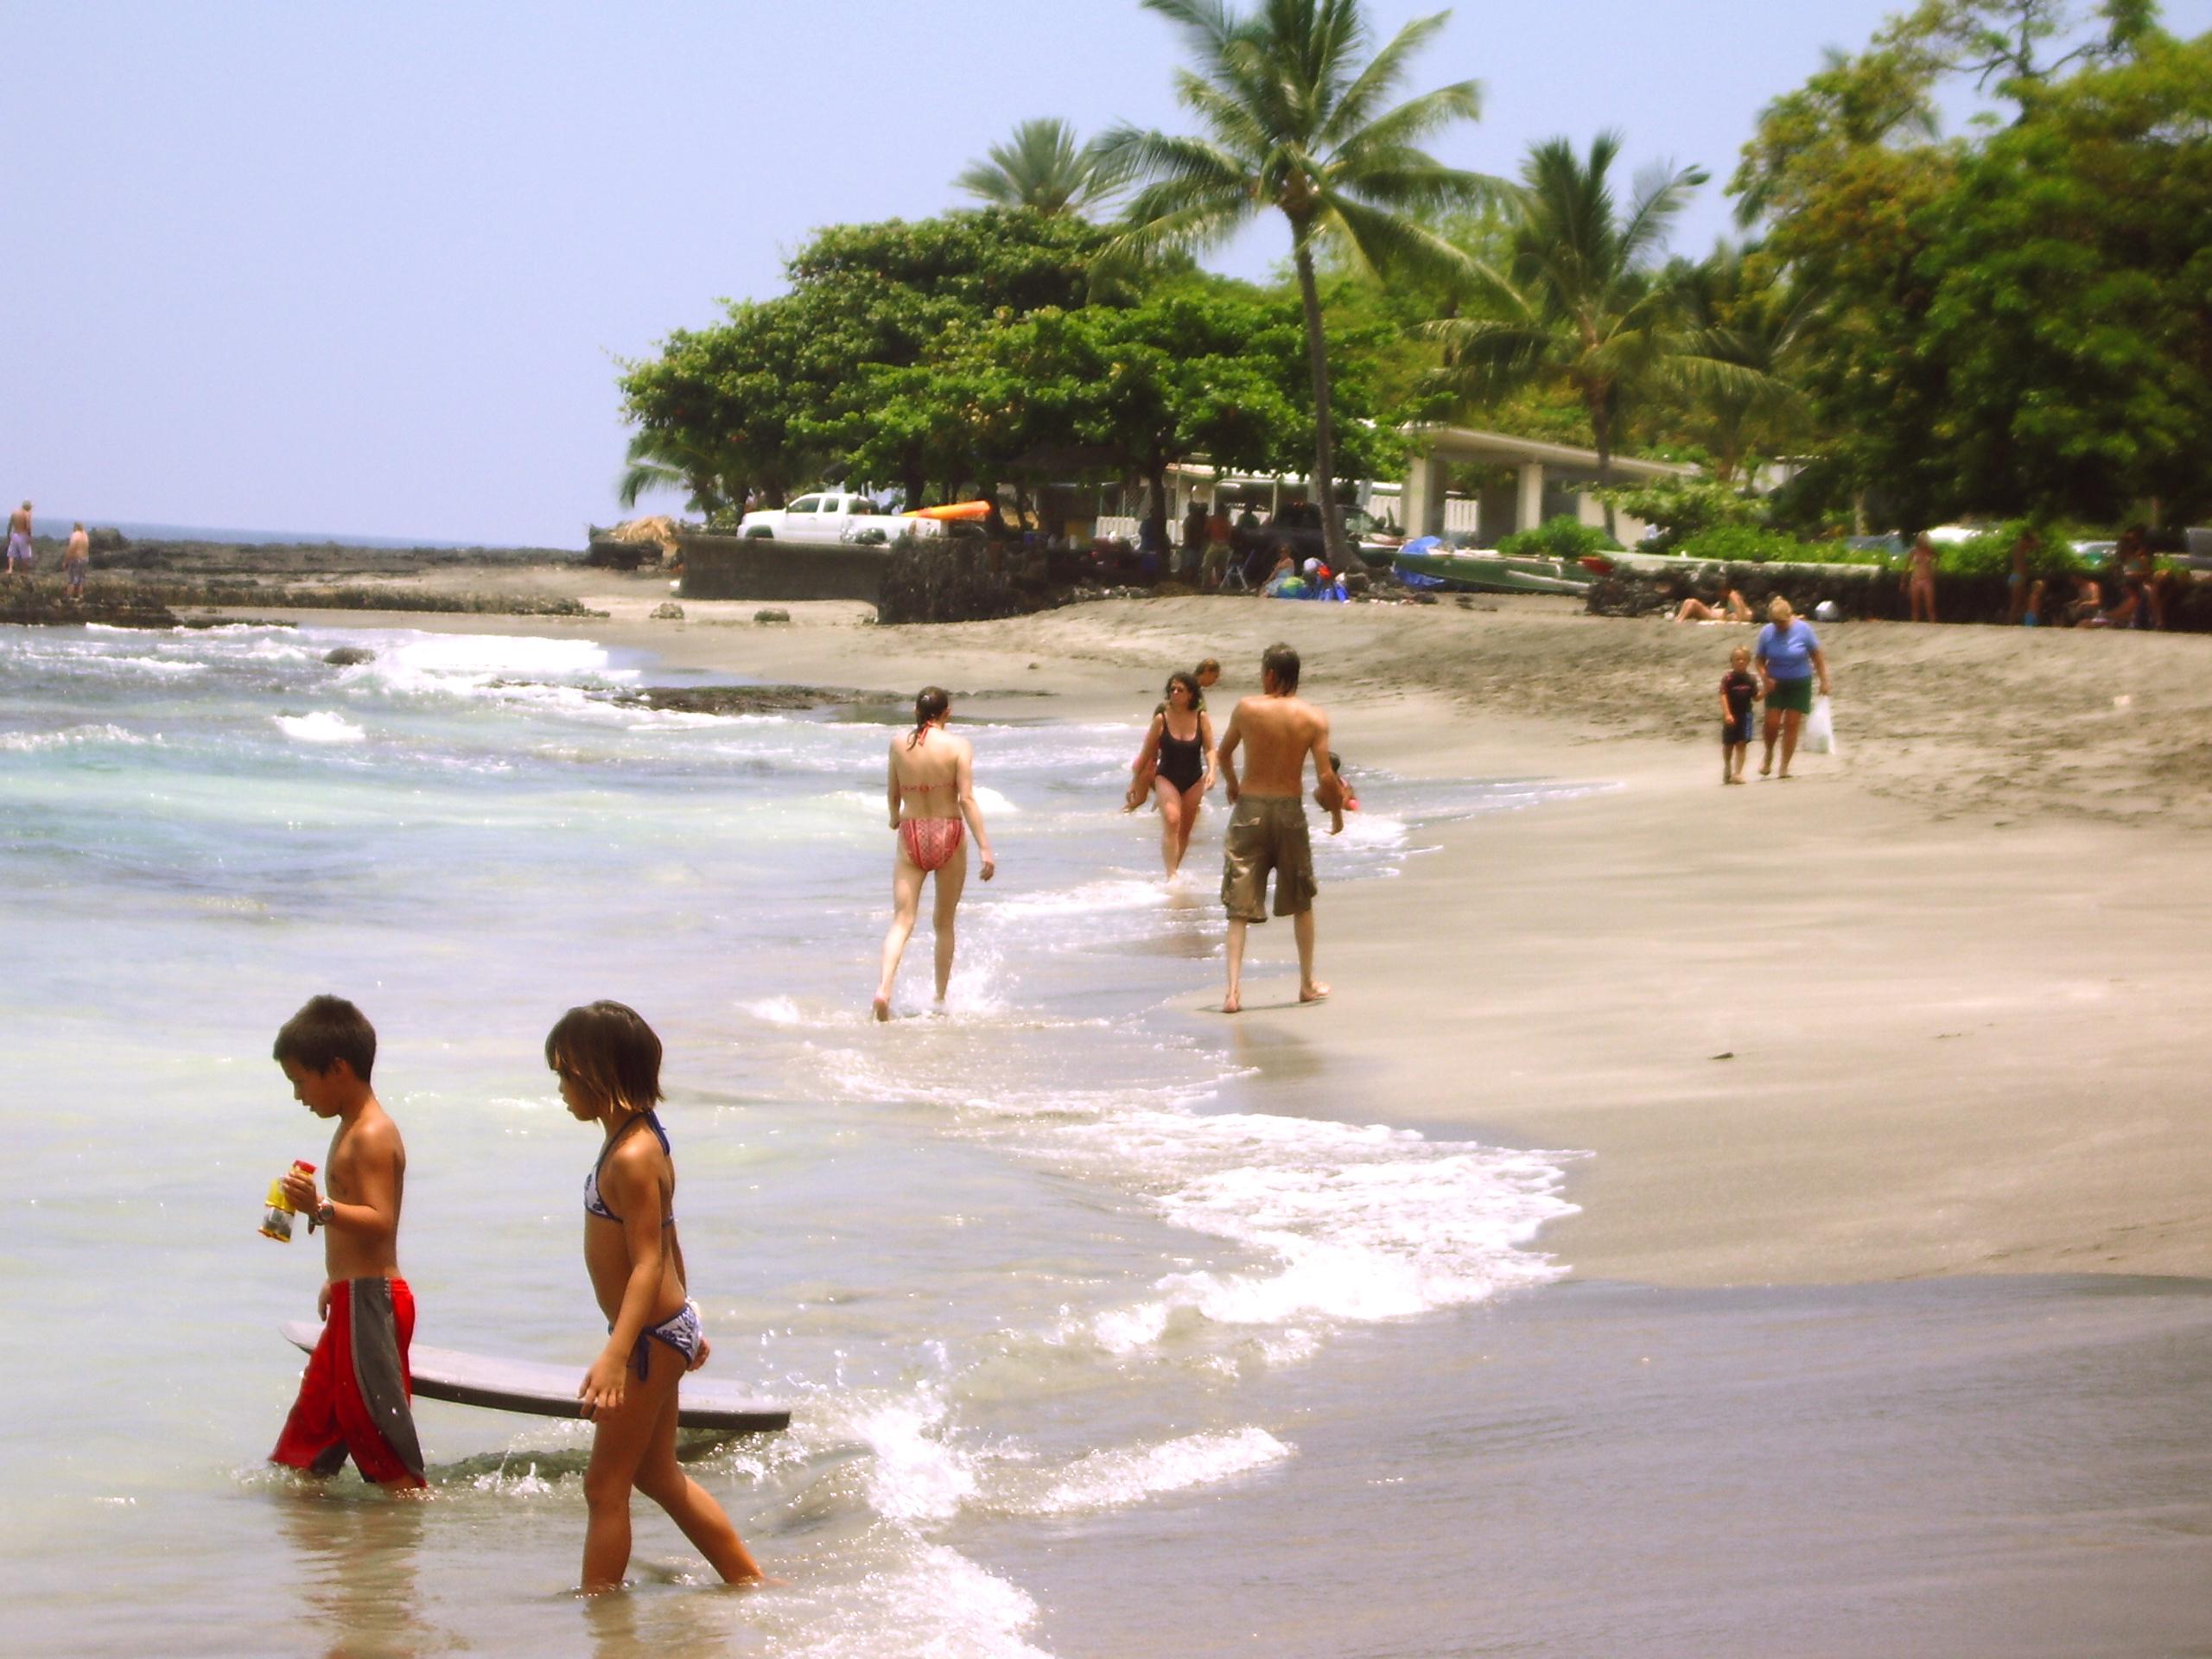 Ho'okena Beach, South Kona: Photo by Donald MacGowan